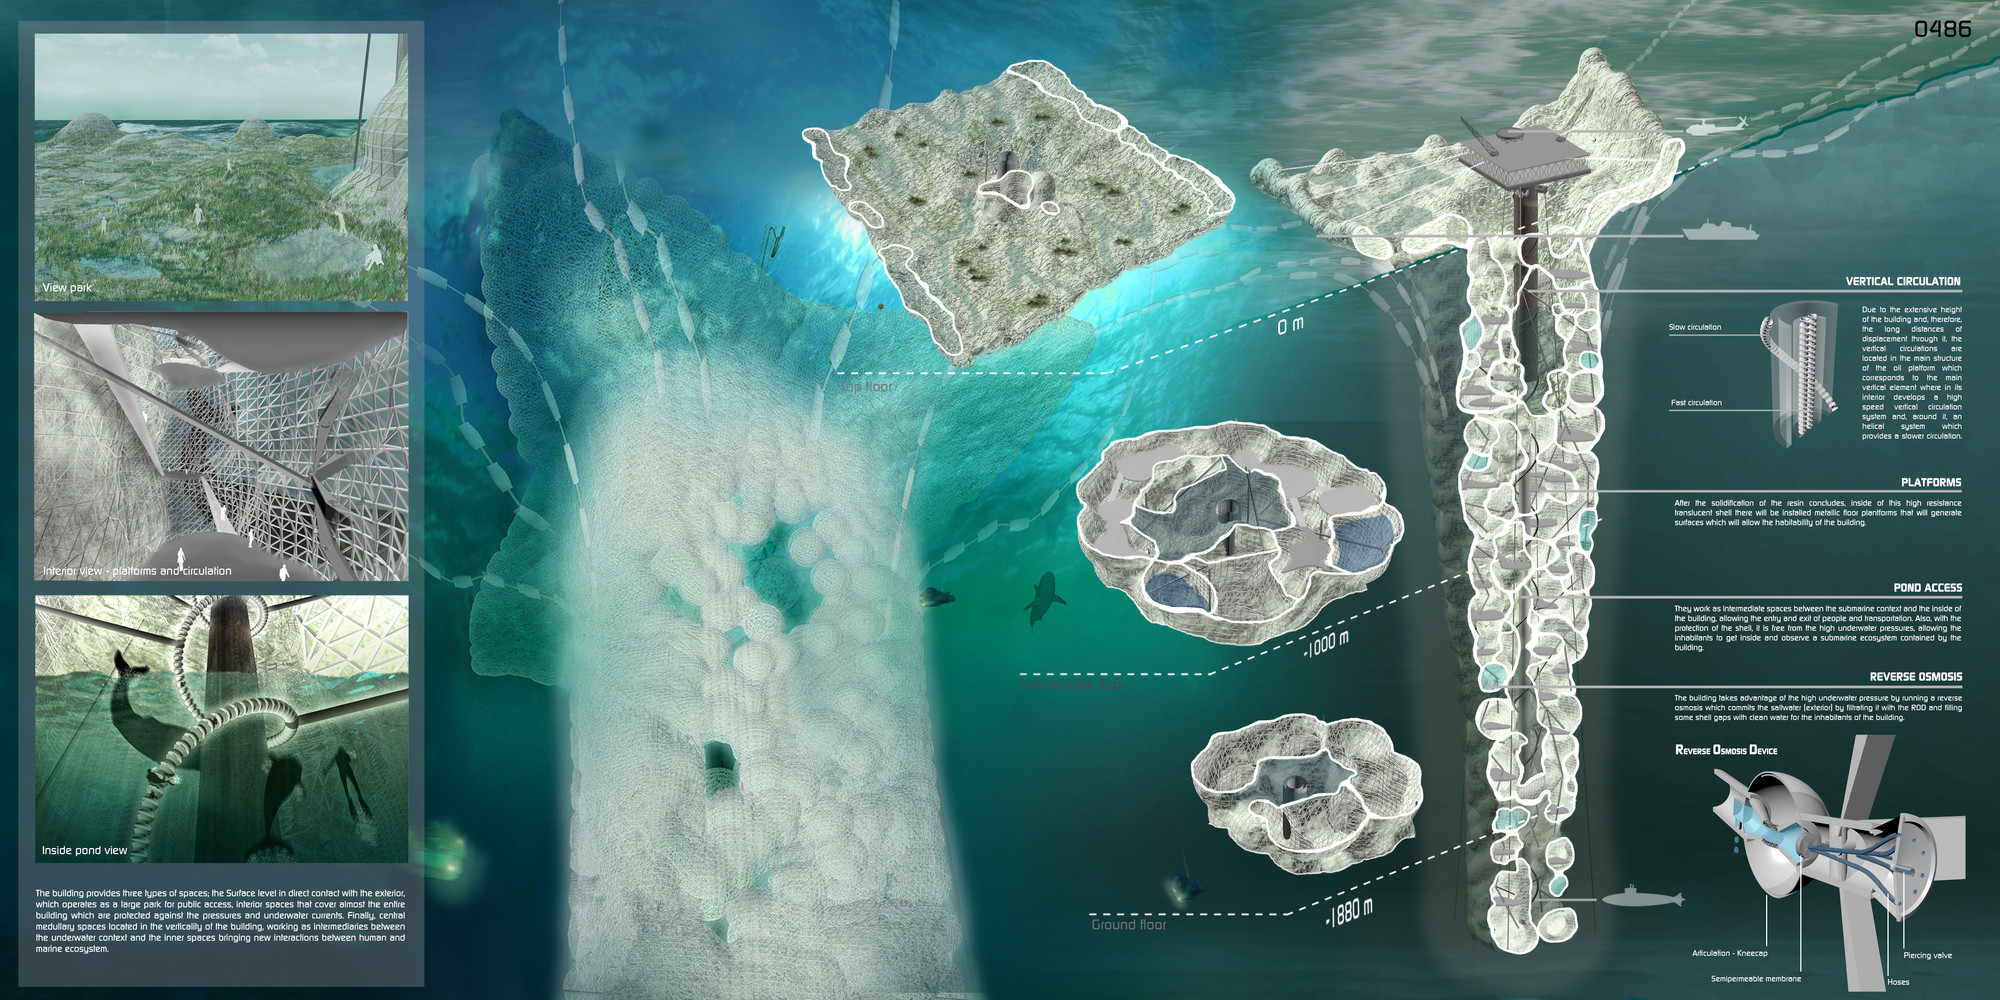 """Submarine Lighthouse"": proponen reutilizar plataformas petrolíferas como rascacielos submarinos, Lámina. Image Courtesy of Pablo Schaelchli y Fabián Cordero"